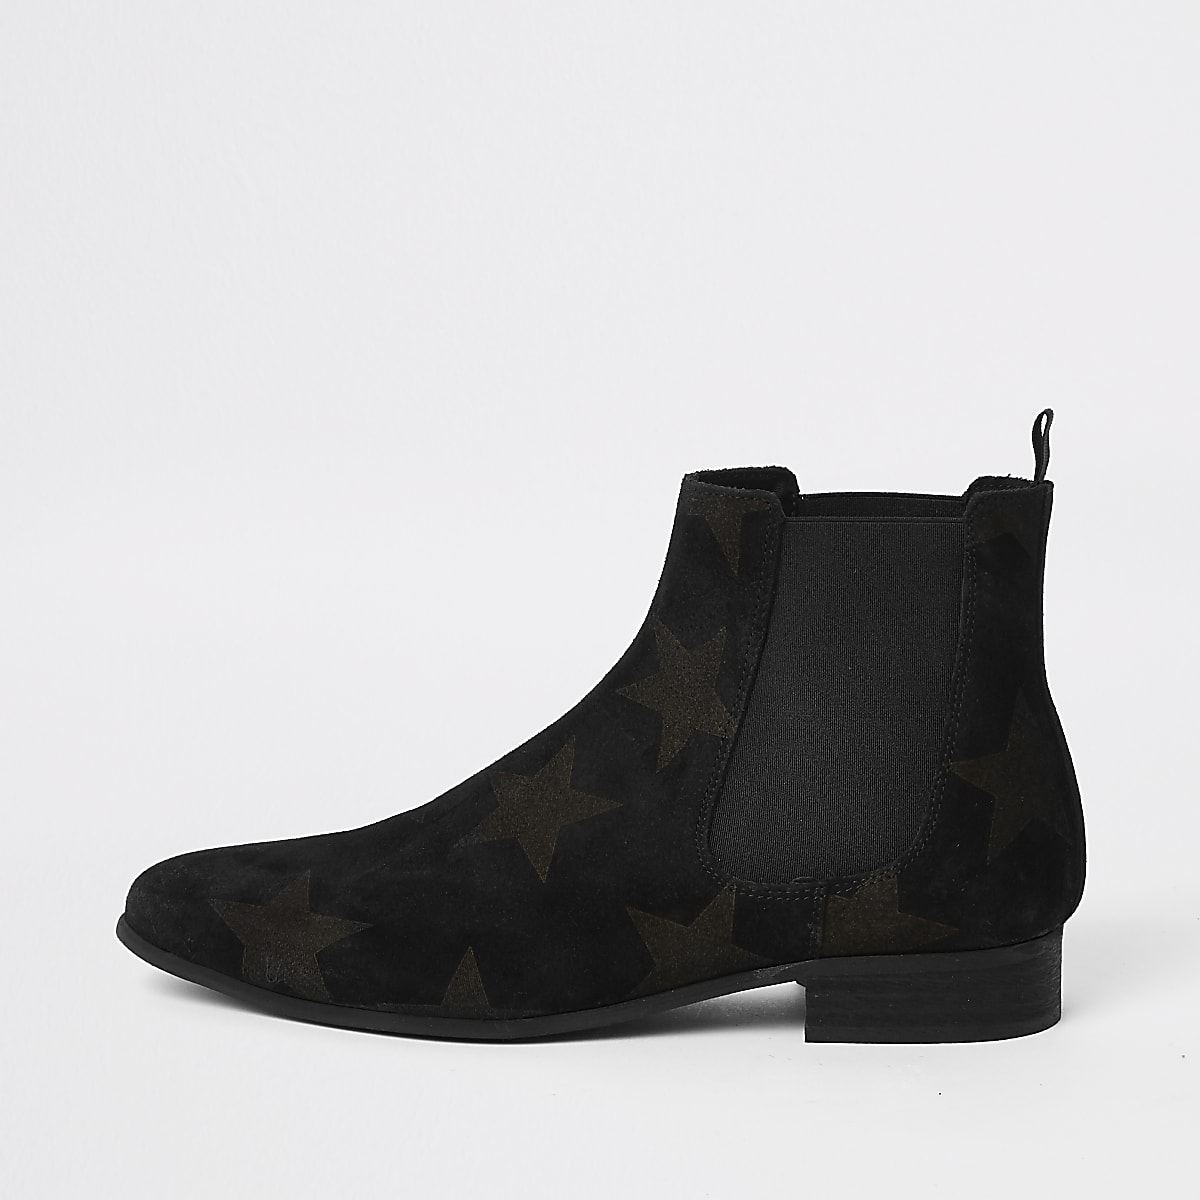 Black suede star embossed Chelsea boots